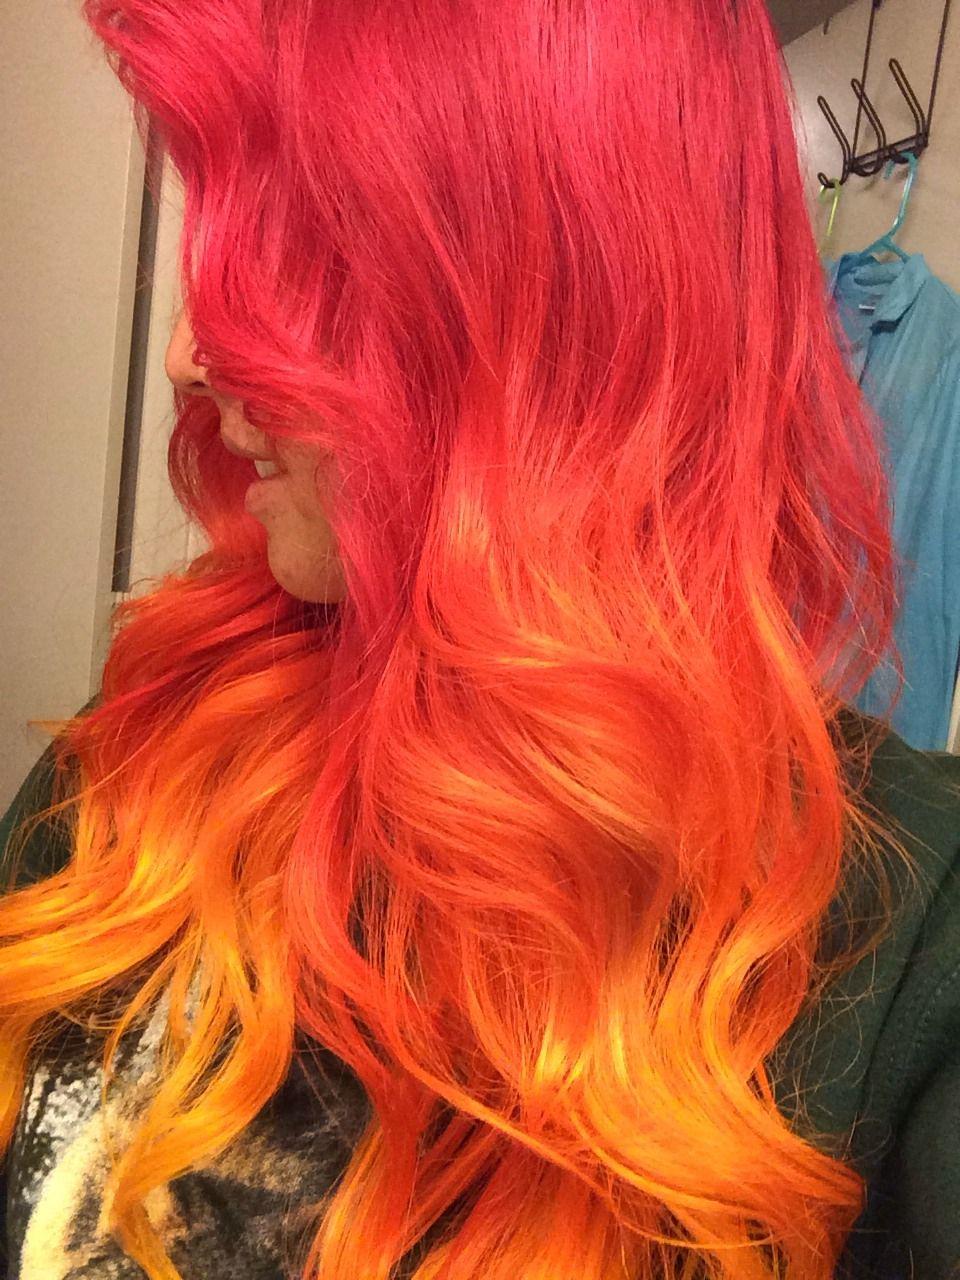 red ombre hair aka fire hair yeaaaa colored hair